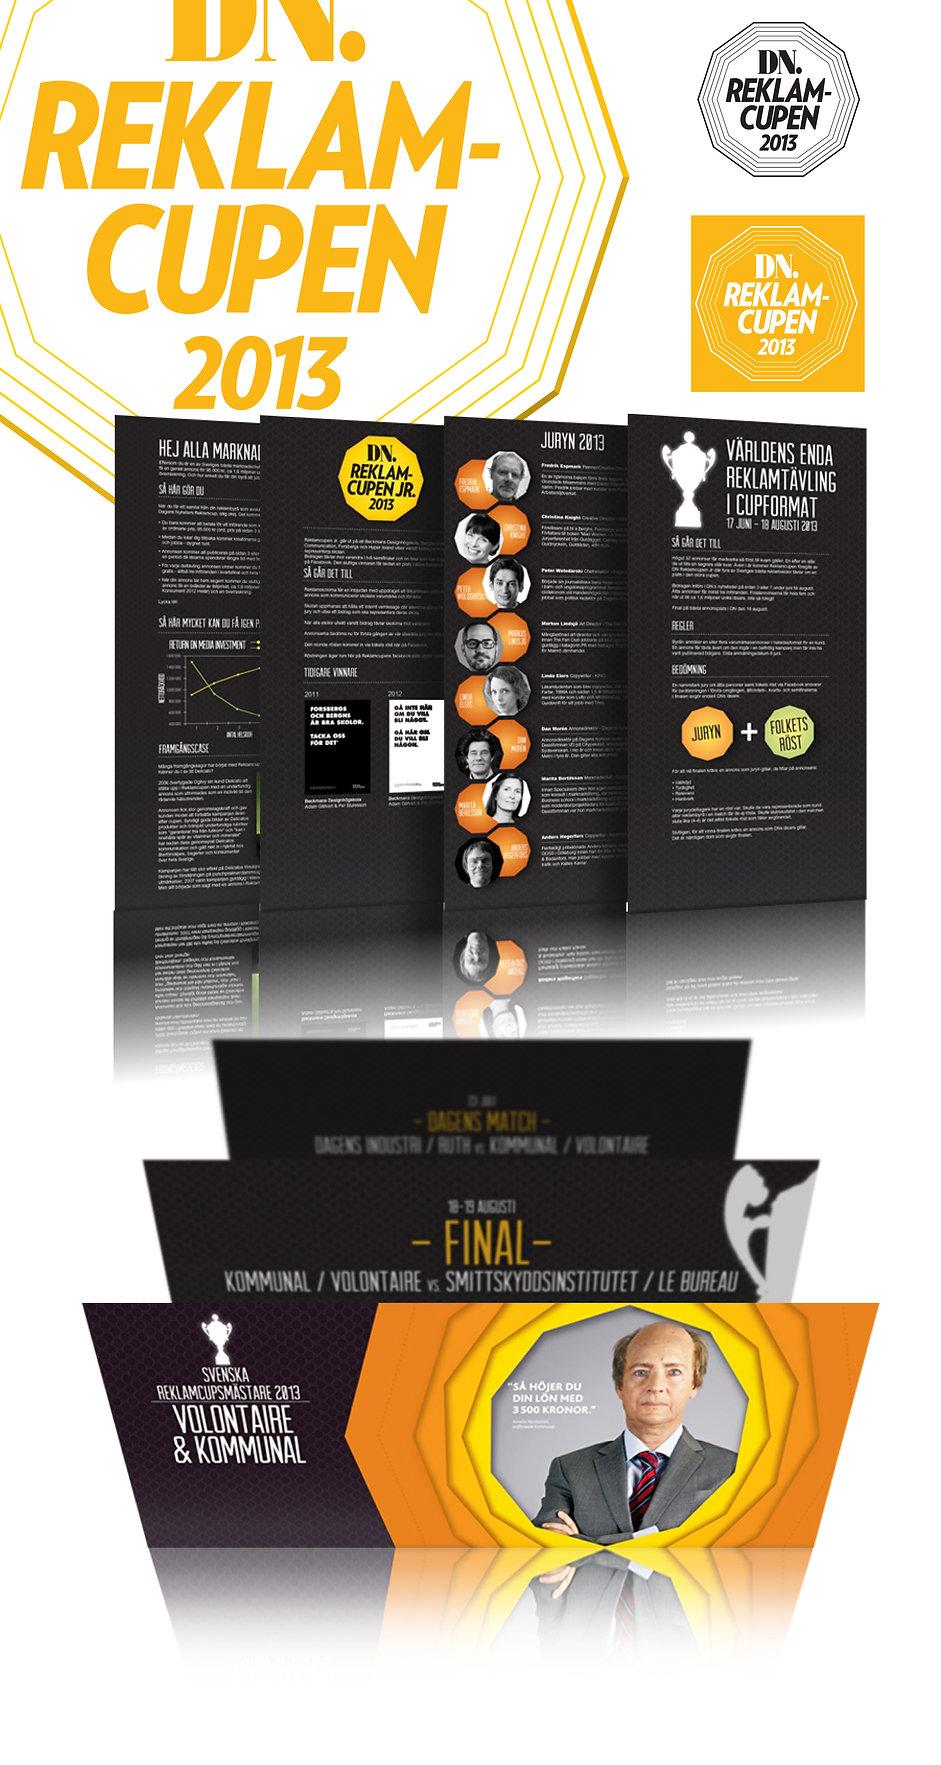 Reklamcupen-samlat.jpg